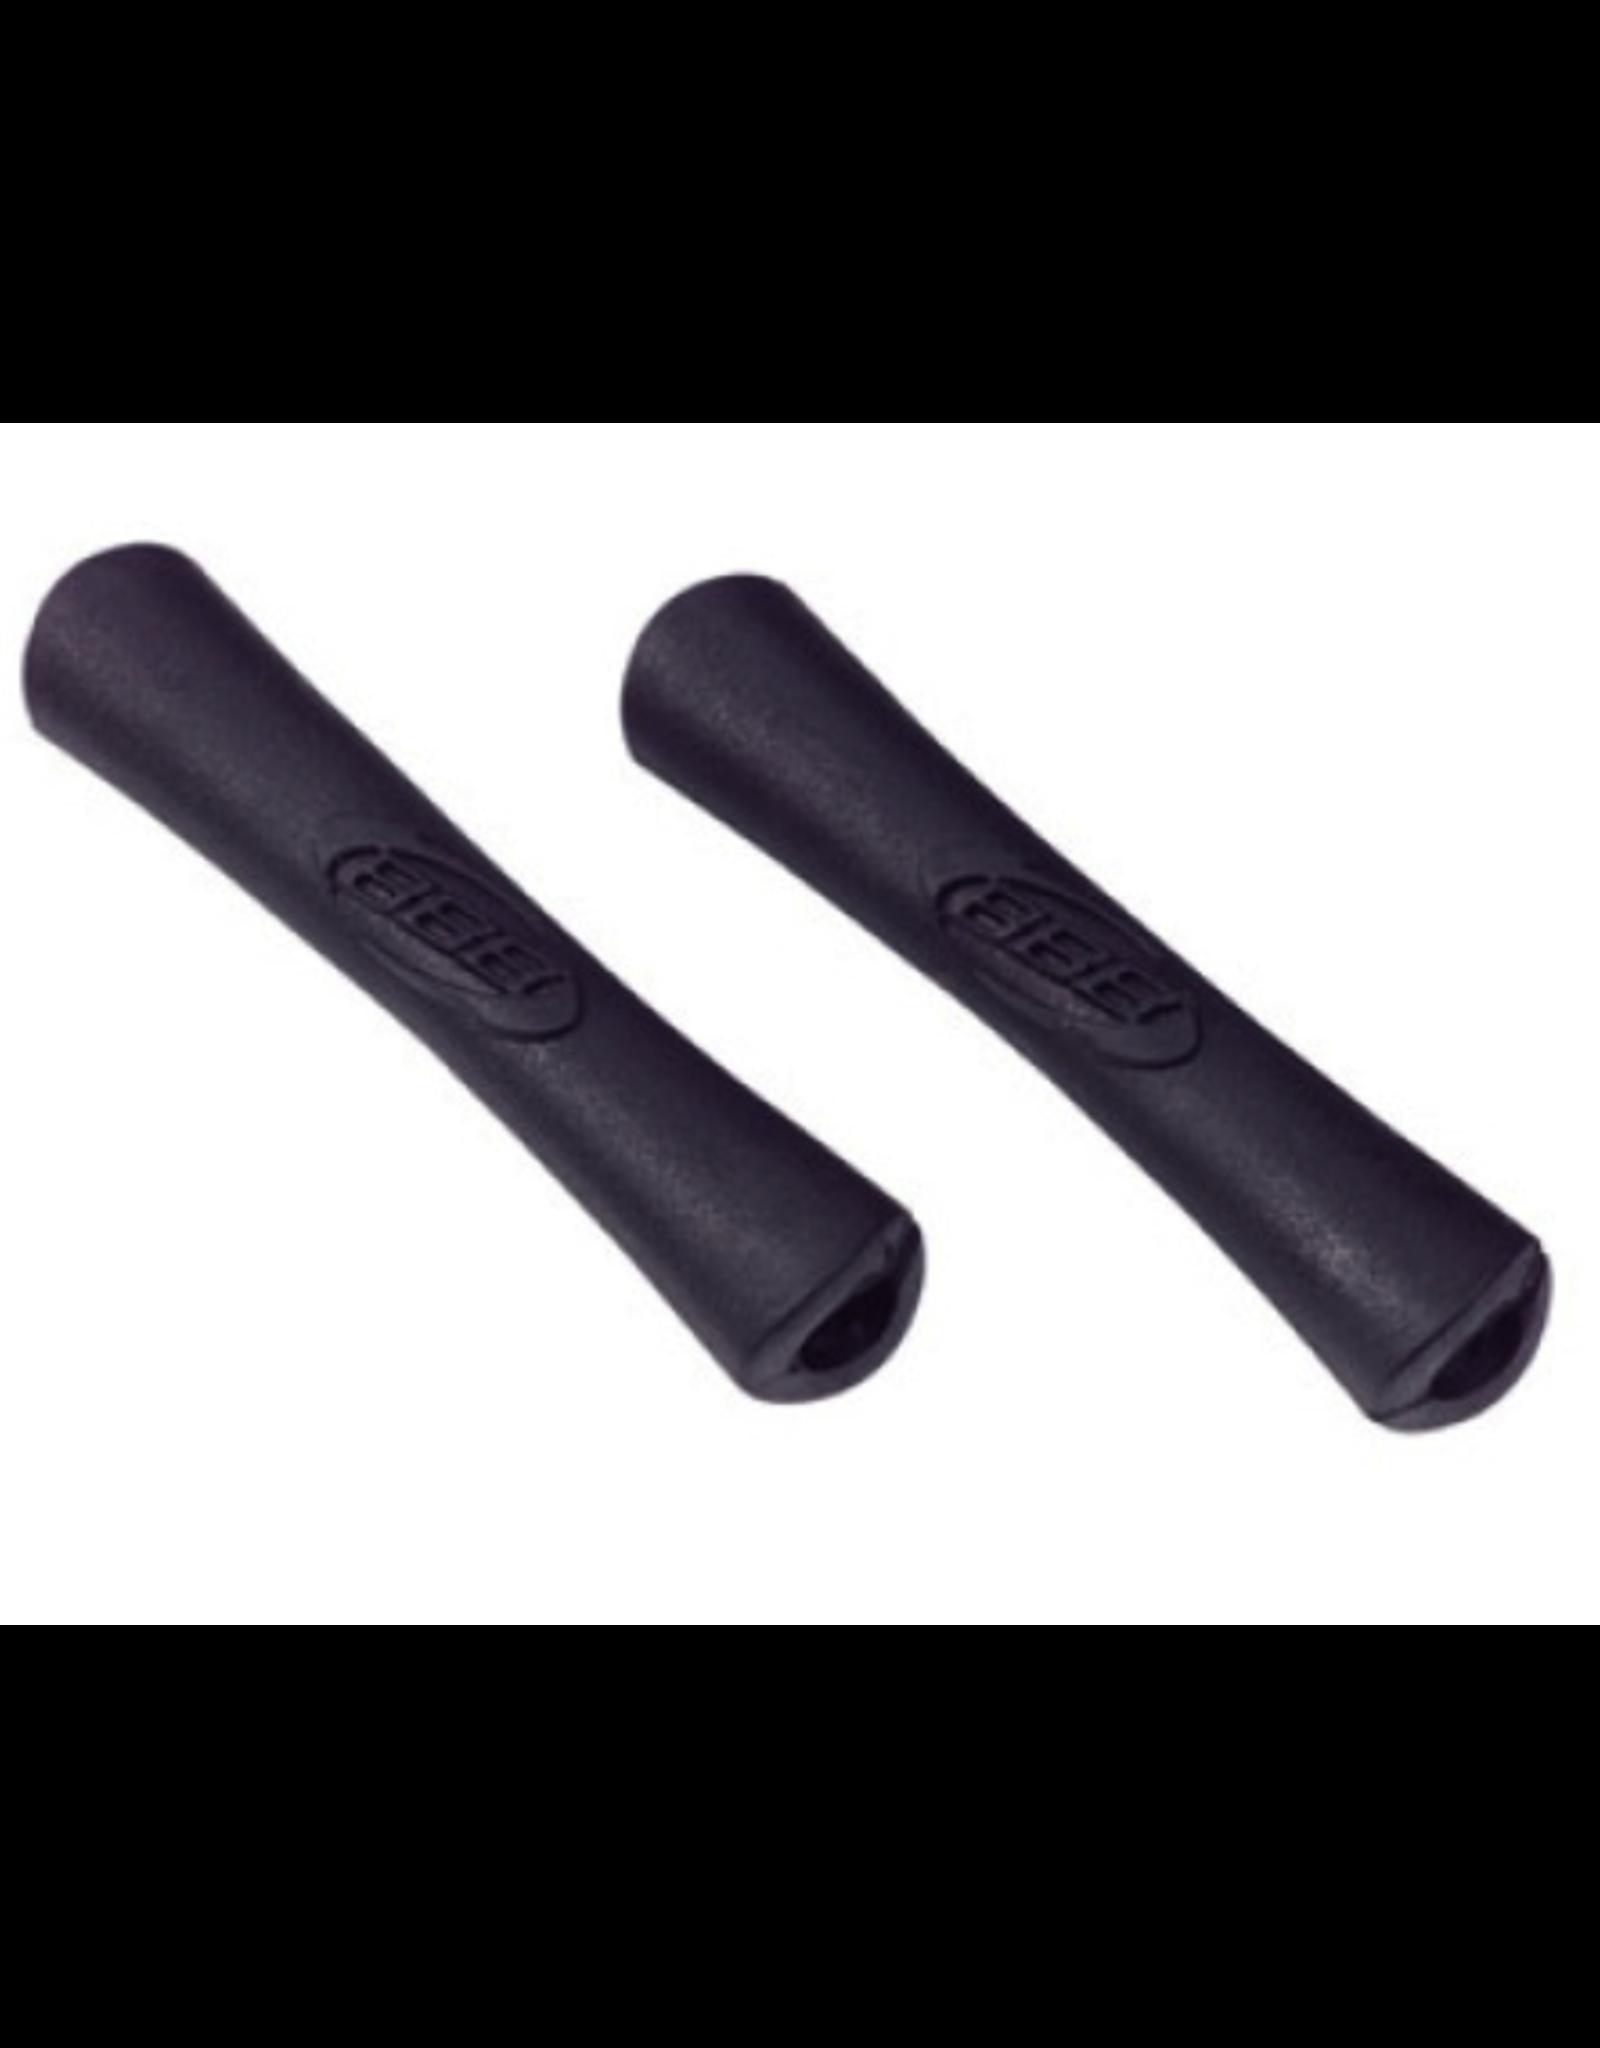 BBB CRD-BCB-90B-CableWrap Frame Protector 5mm x2 (Blk) tf>2909059031